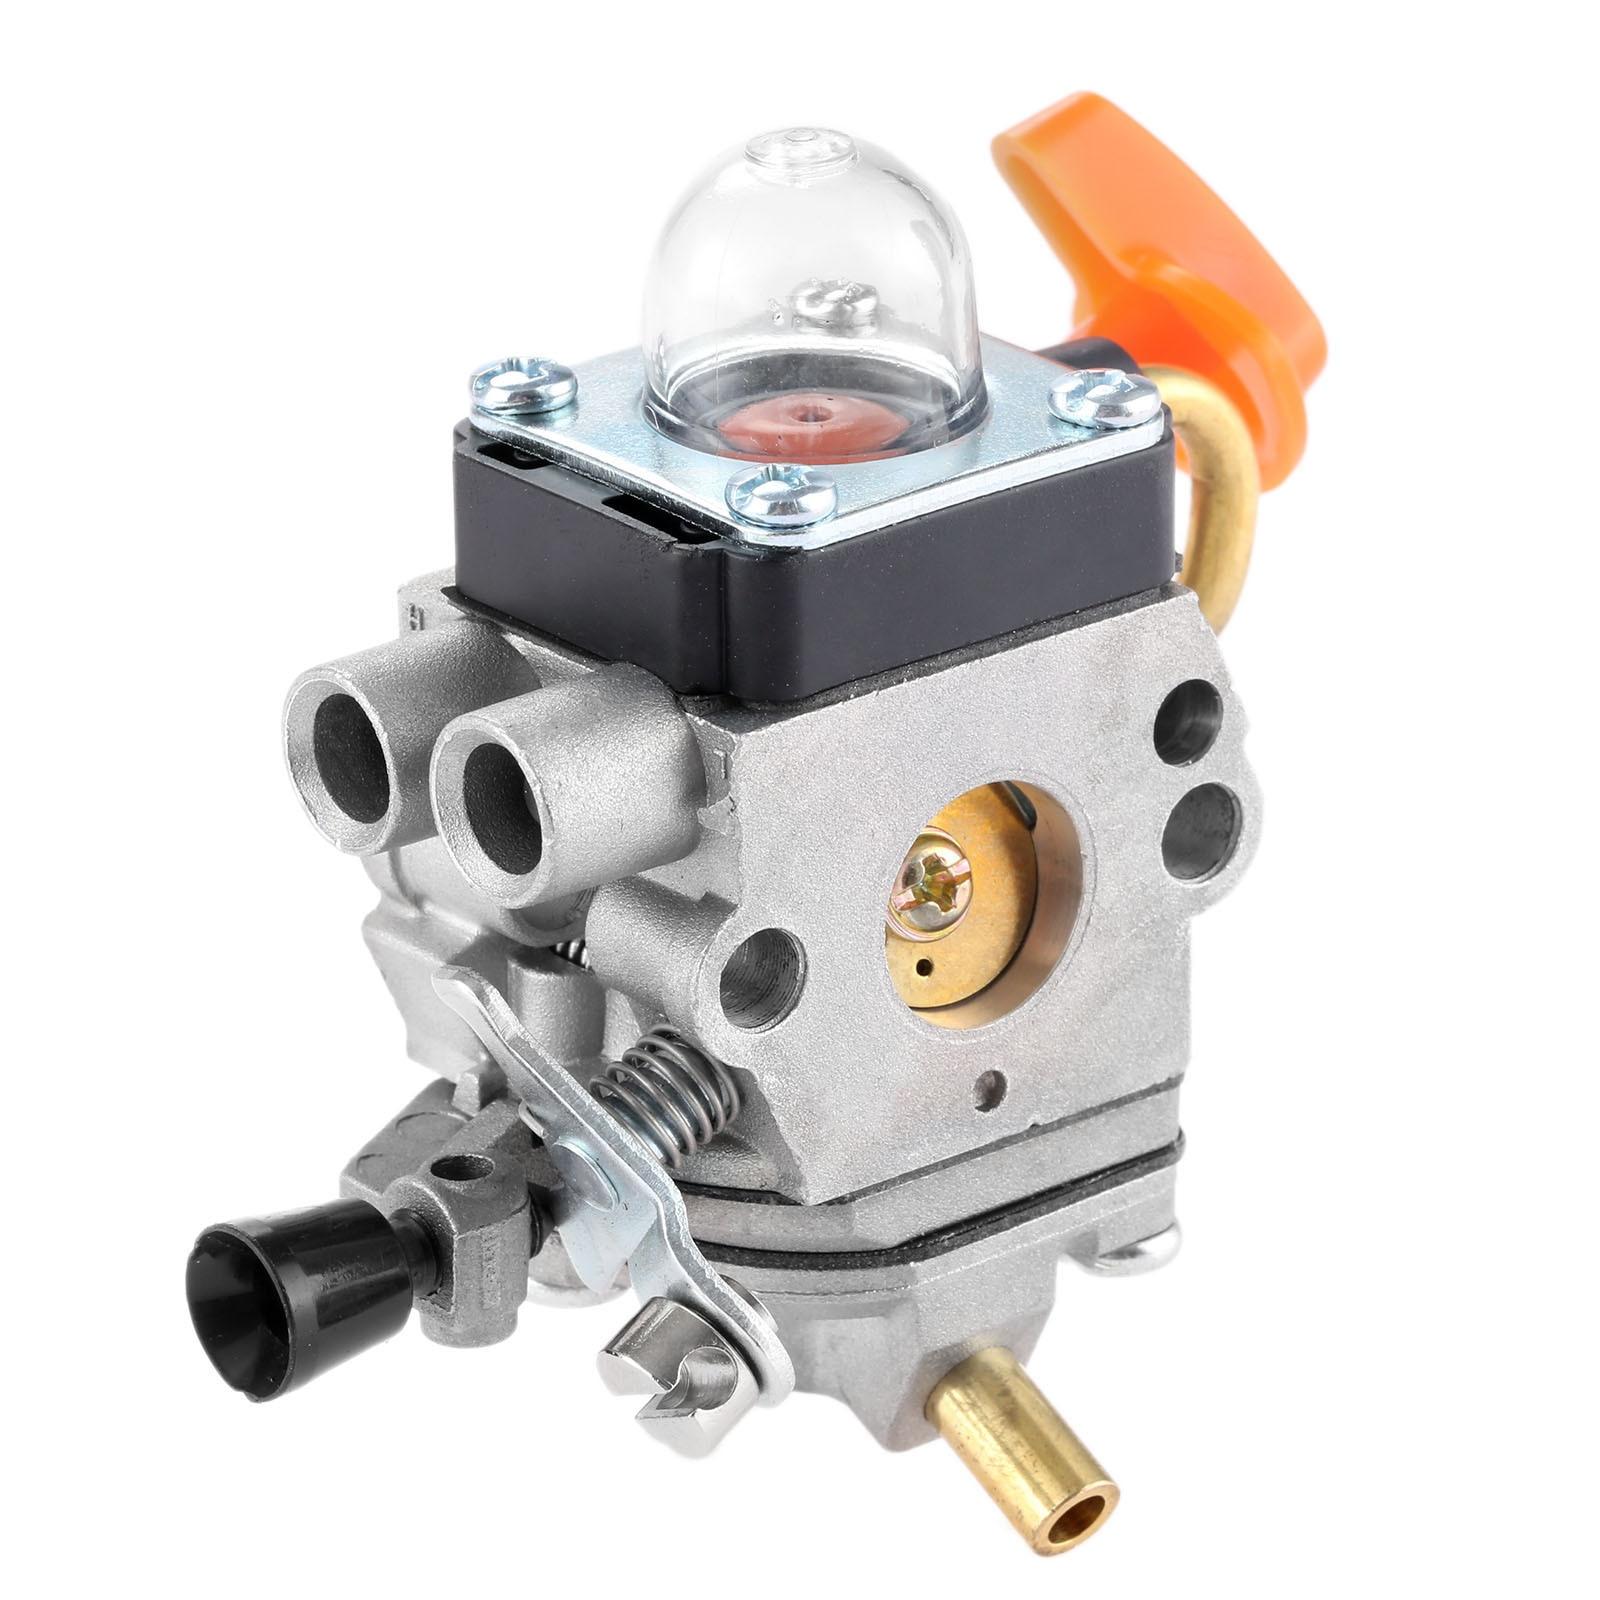 DRELD Carburetor Carb For Stihl FS87 FS90 FS100 KM100 FS110 KM110 FS130 KM130 HT130 Trimmer Engine Spare Part ZAMA C1Q-S173 S174DRELD Carburetor Carb For Stihl FS87 FS90 FS100 KM100 FS110 KM110 FS130 KM130 HT130 Trimmer Engine Spare Part ZAMA C1Q-S173 S174